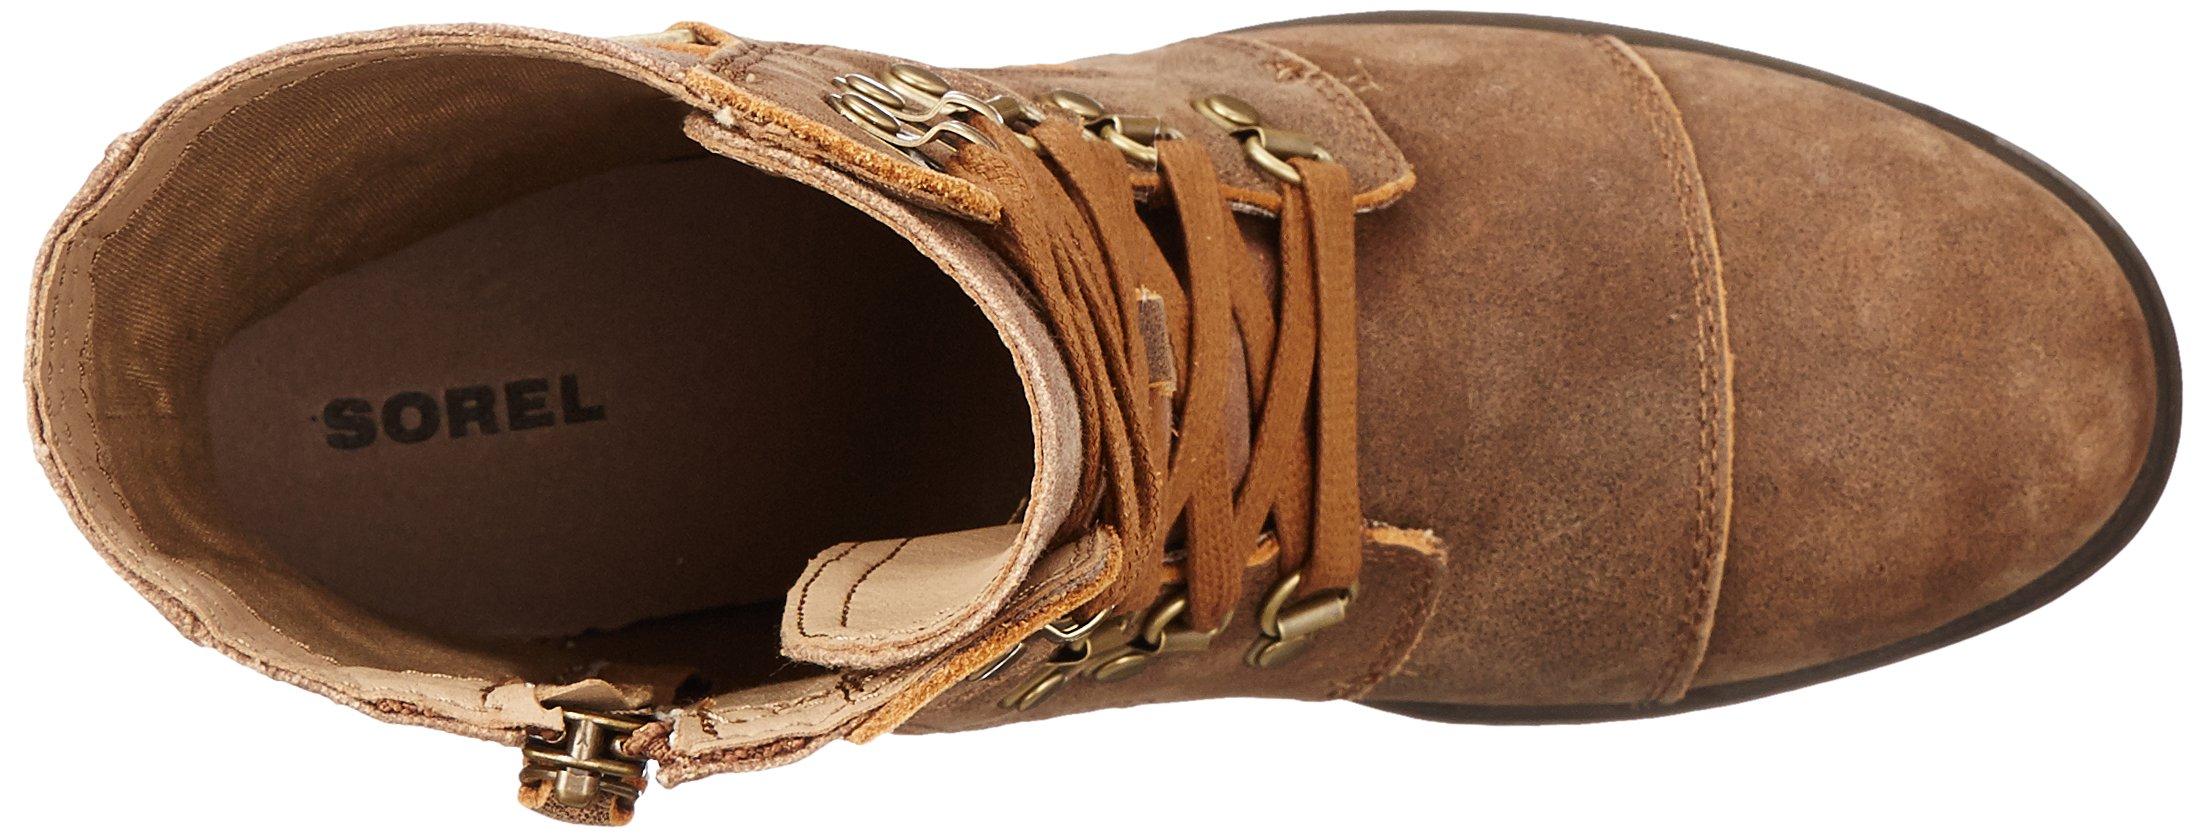 Sorel Women's Major Carly Snow Boot, Nutmeg, Flax, 8 B US by SOREL (Image #8)